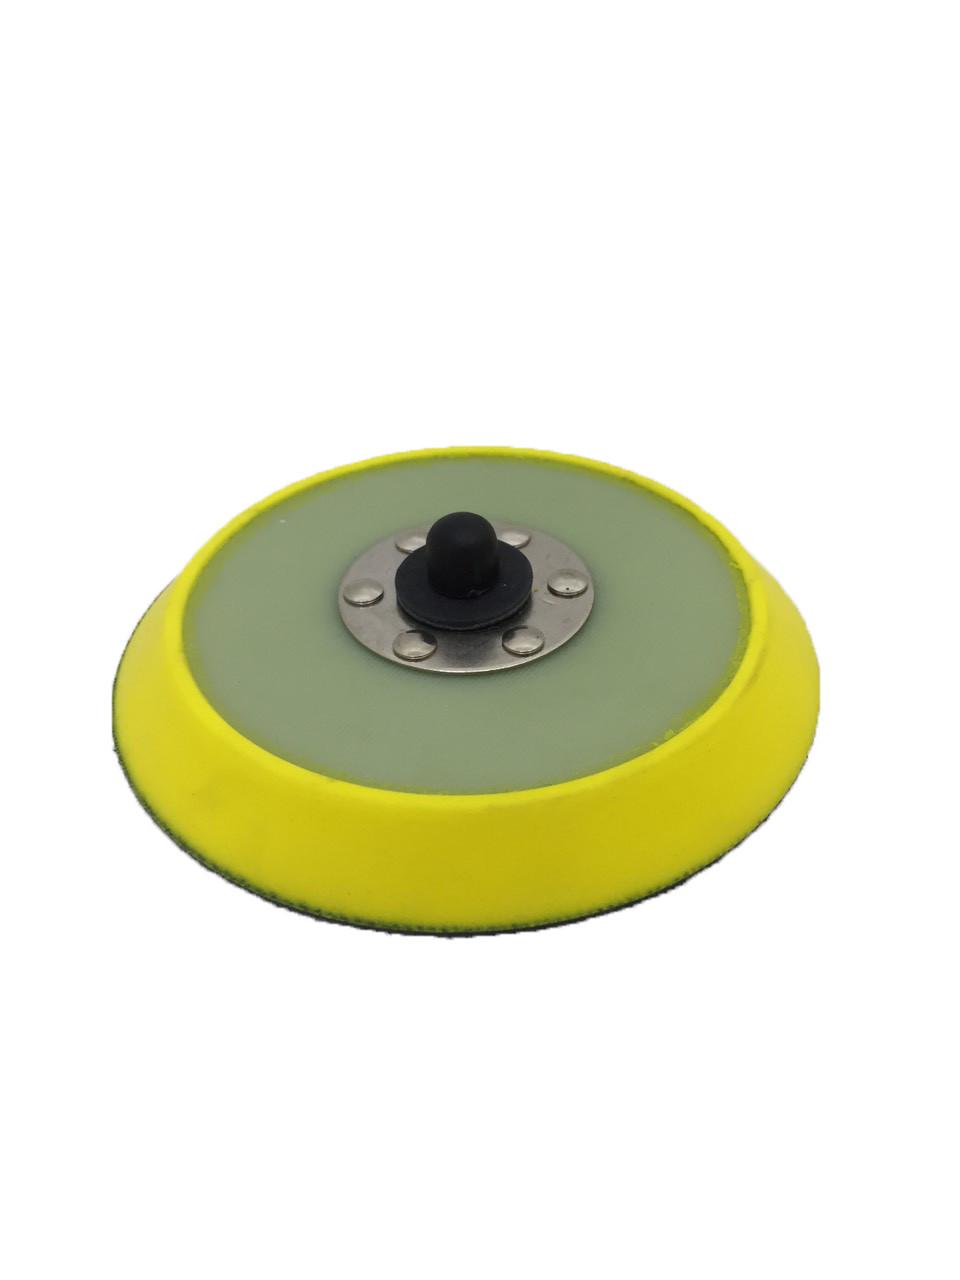 "Оправка на эксцентриковую машинку 5/16"" - Lake Country DA Backing Plates Yellow Urethane 125 мм. (43-125DAR)"